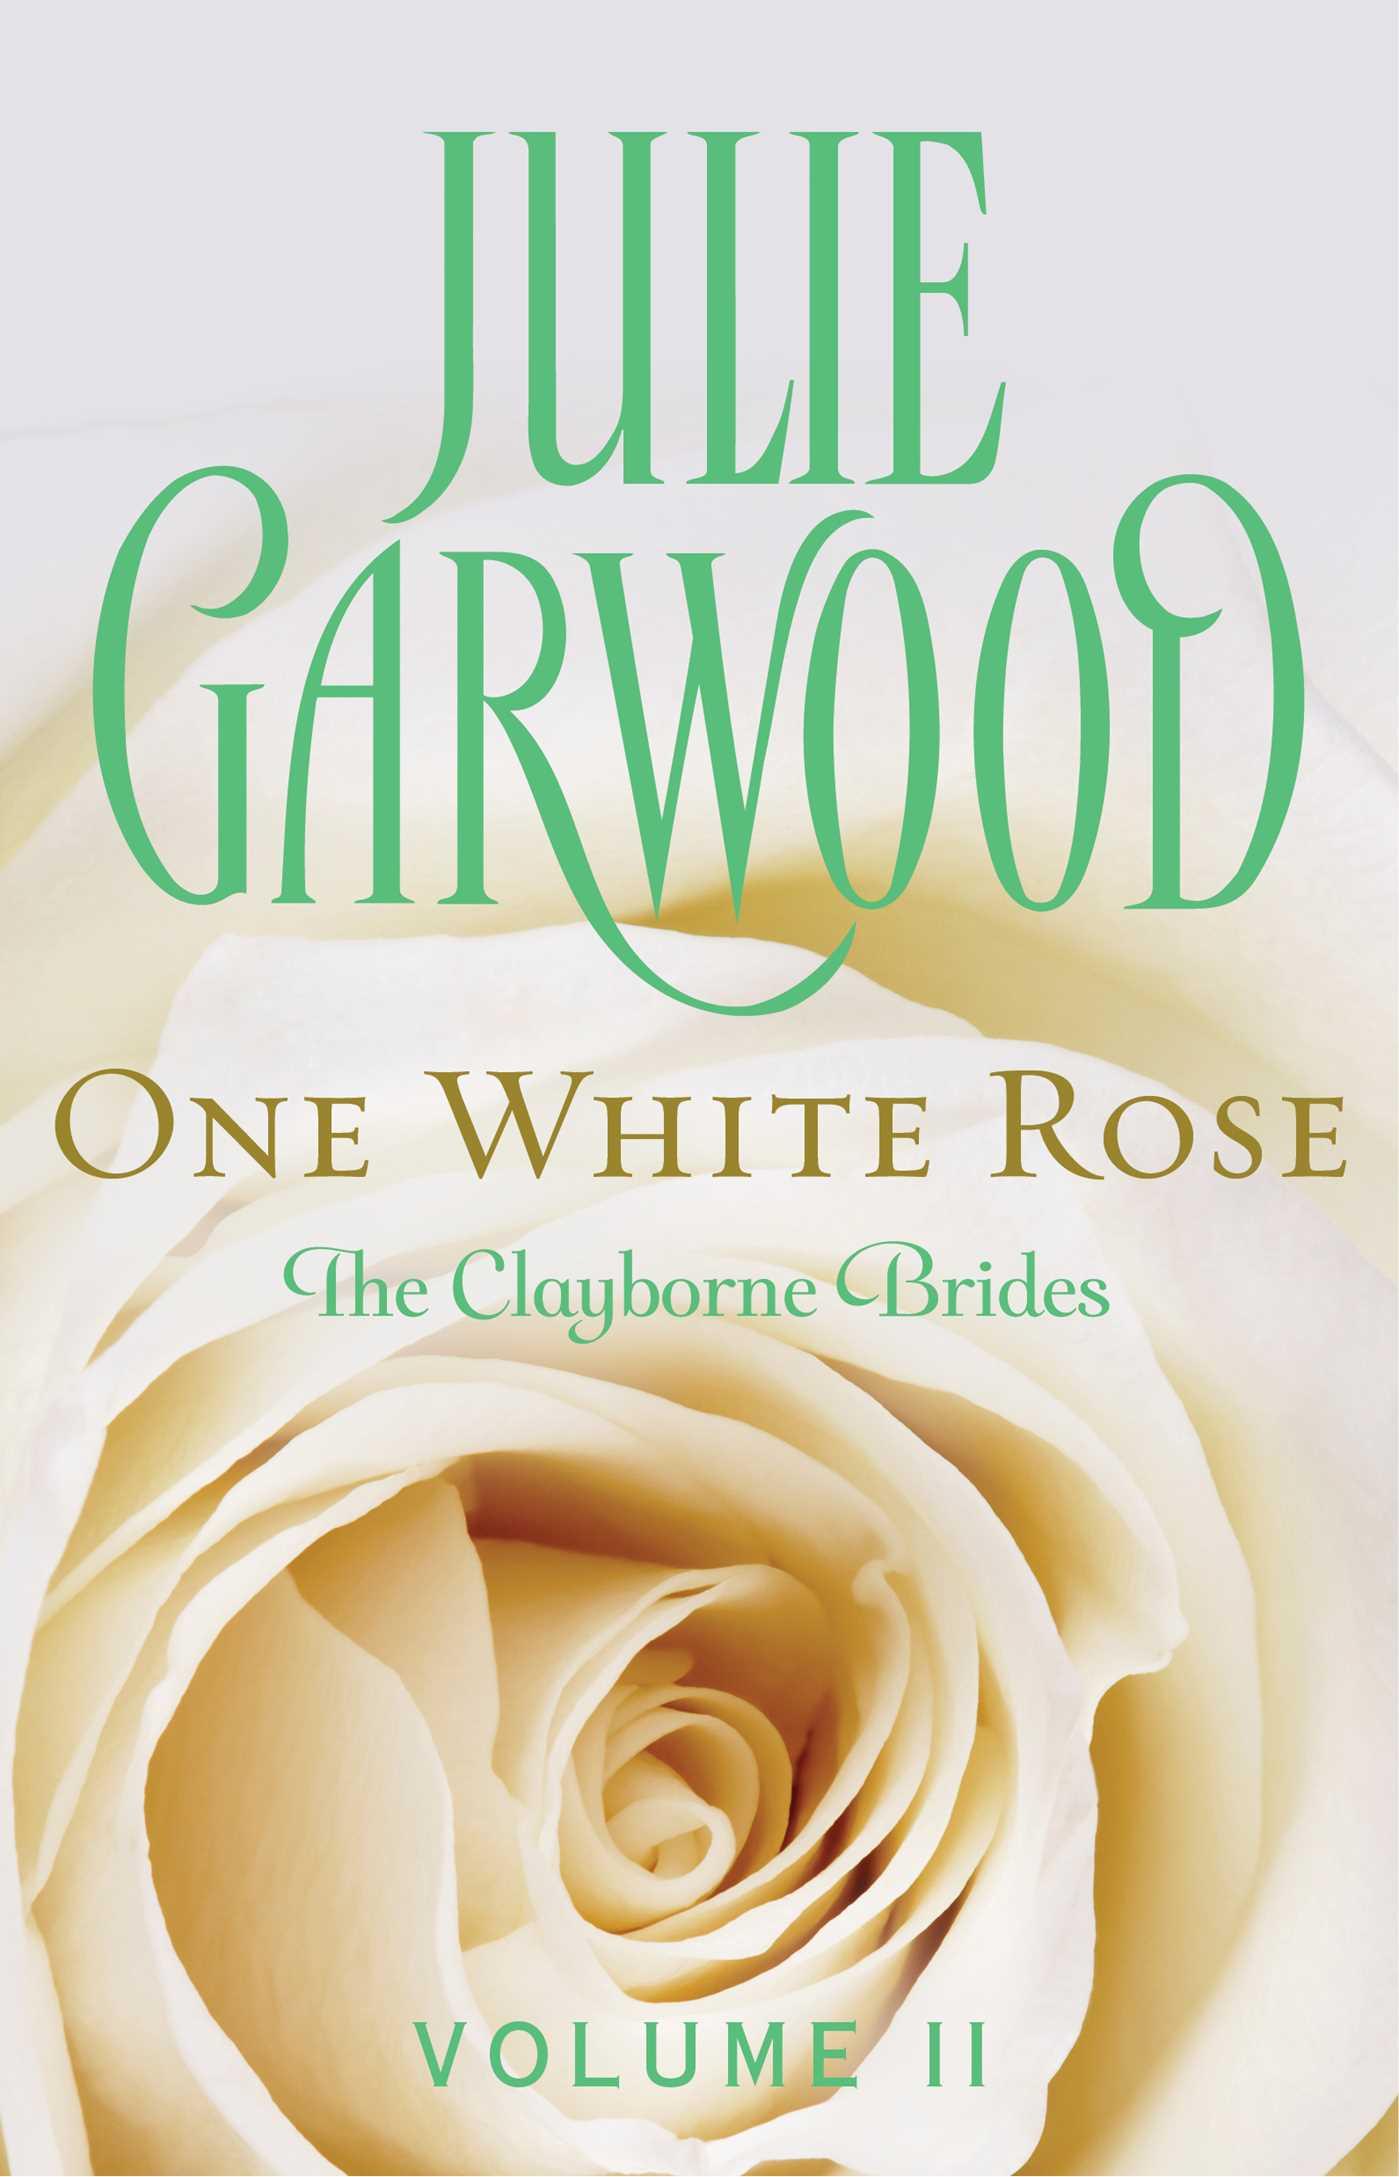 One white rose 9781501131455 hr